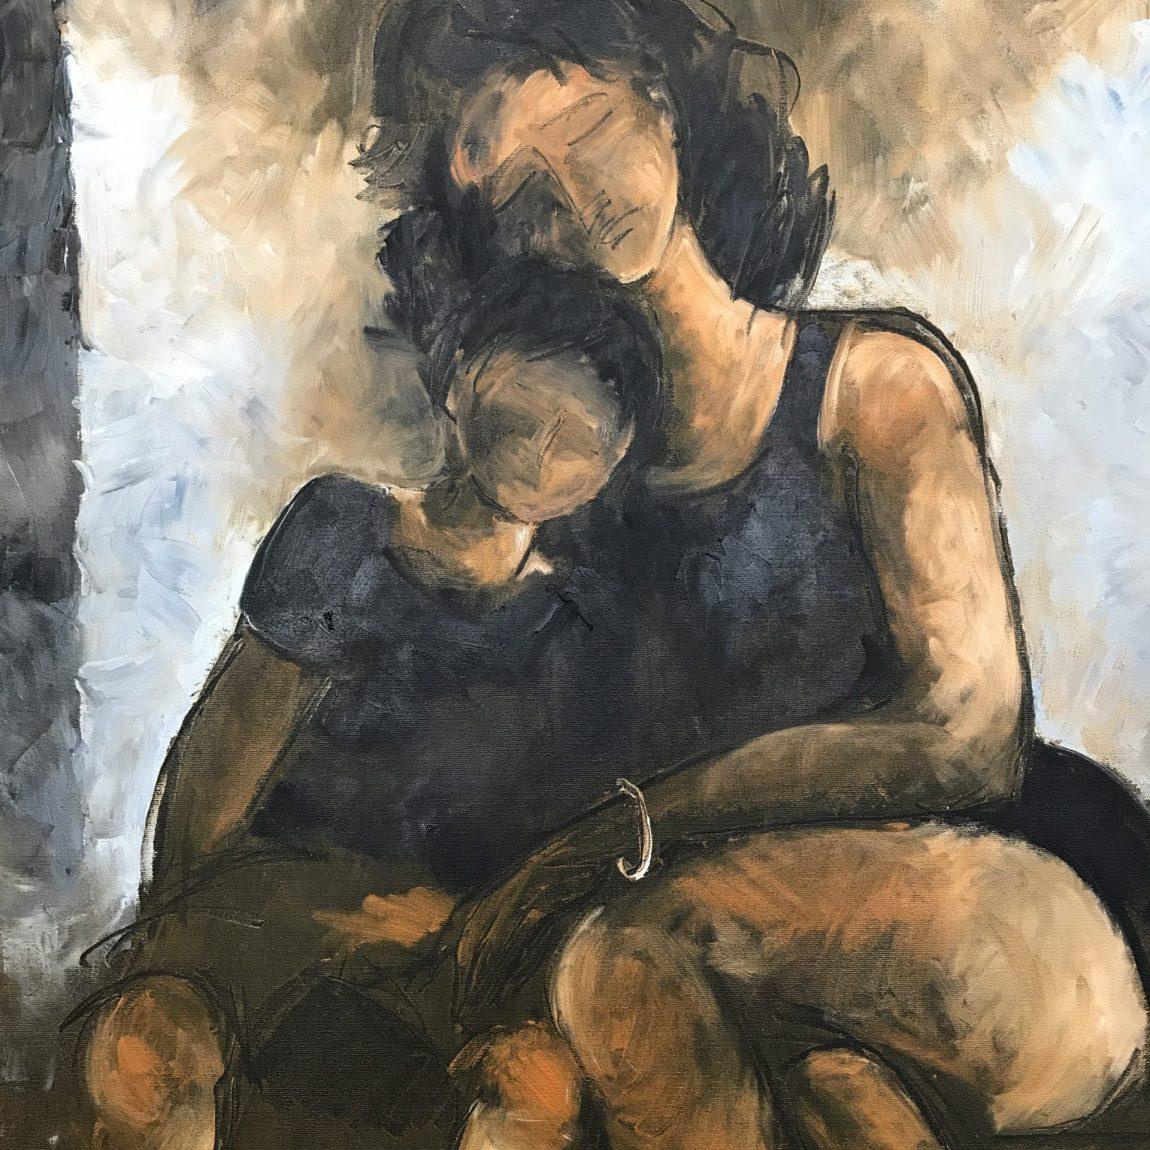 Nihal Şenlier - Teknik: Tuval Üzeri Yağlı Boya Ölçü: 83 x 65  cm Fiyat : 9.450 TL